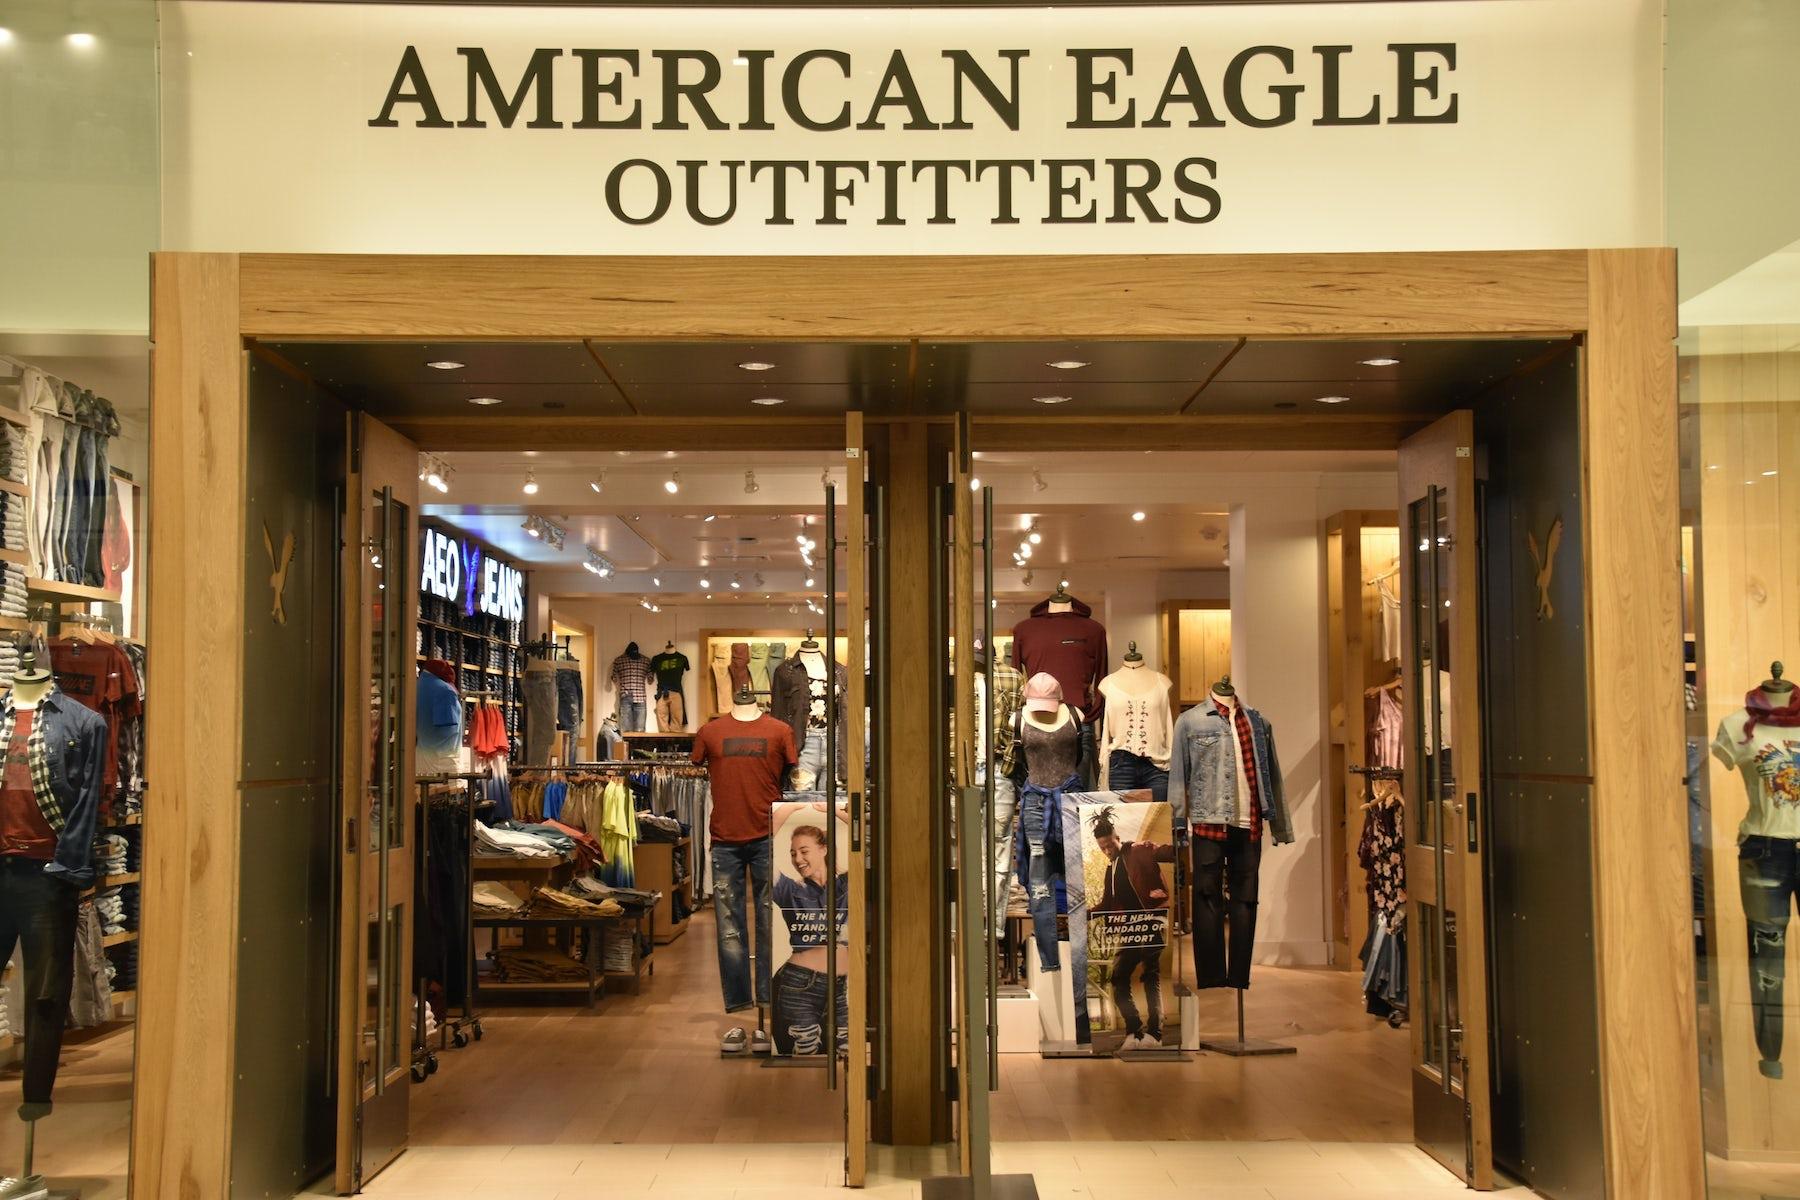 American Eagle store. Shutterstock.